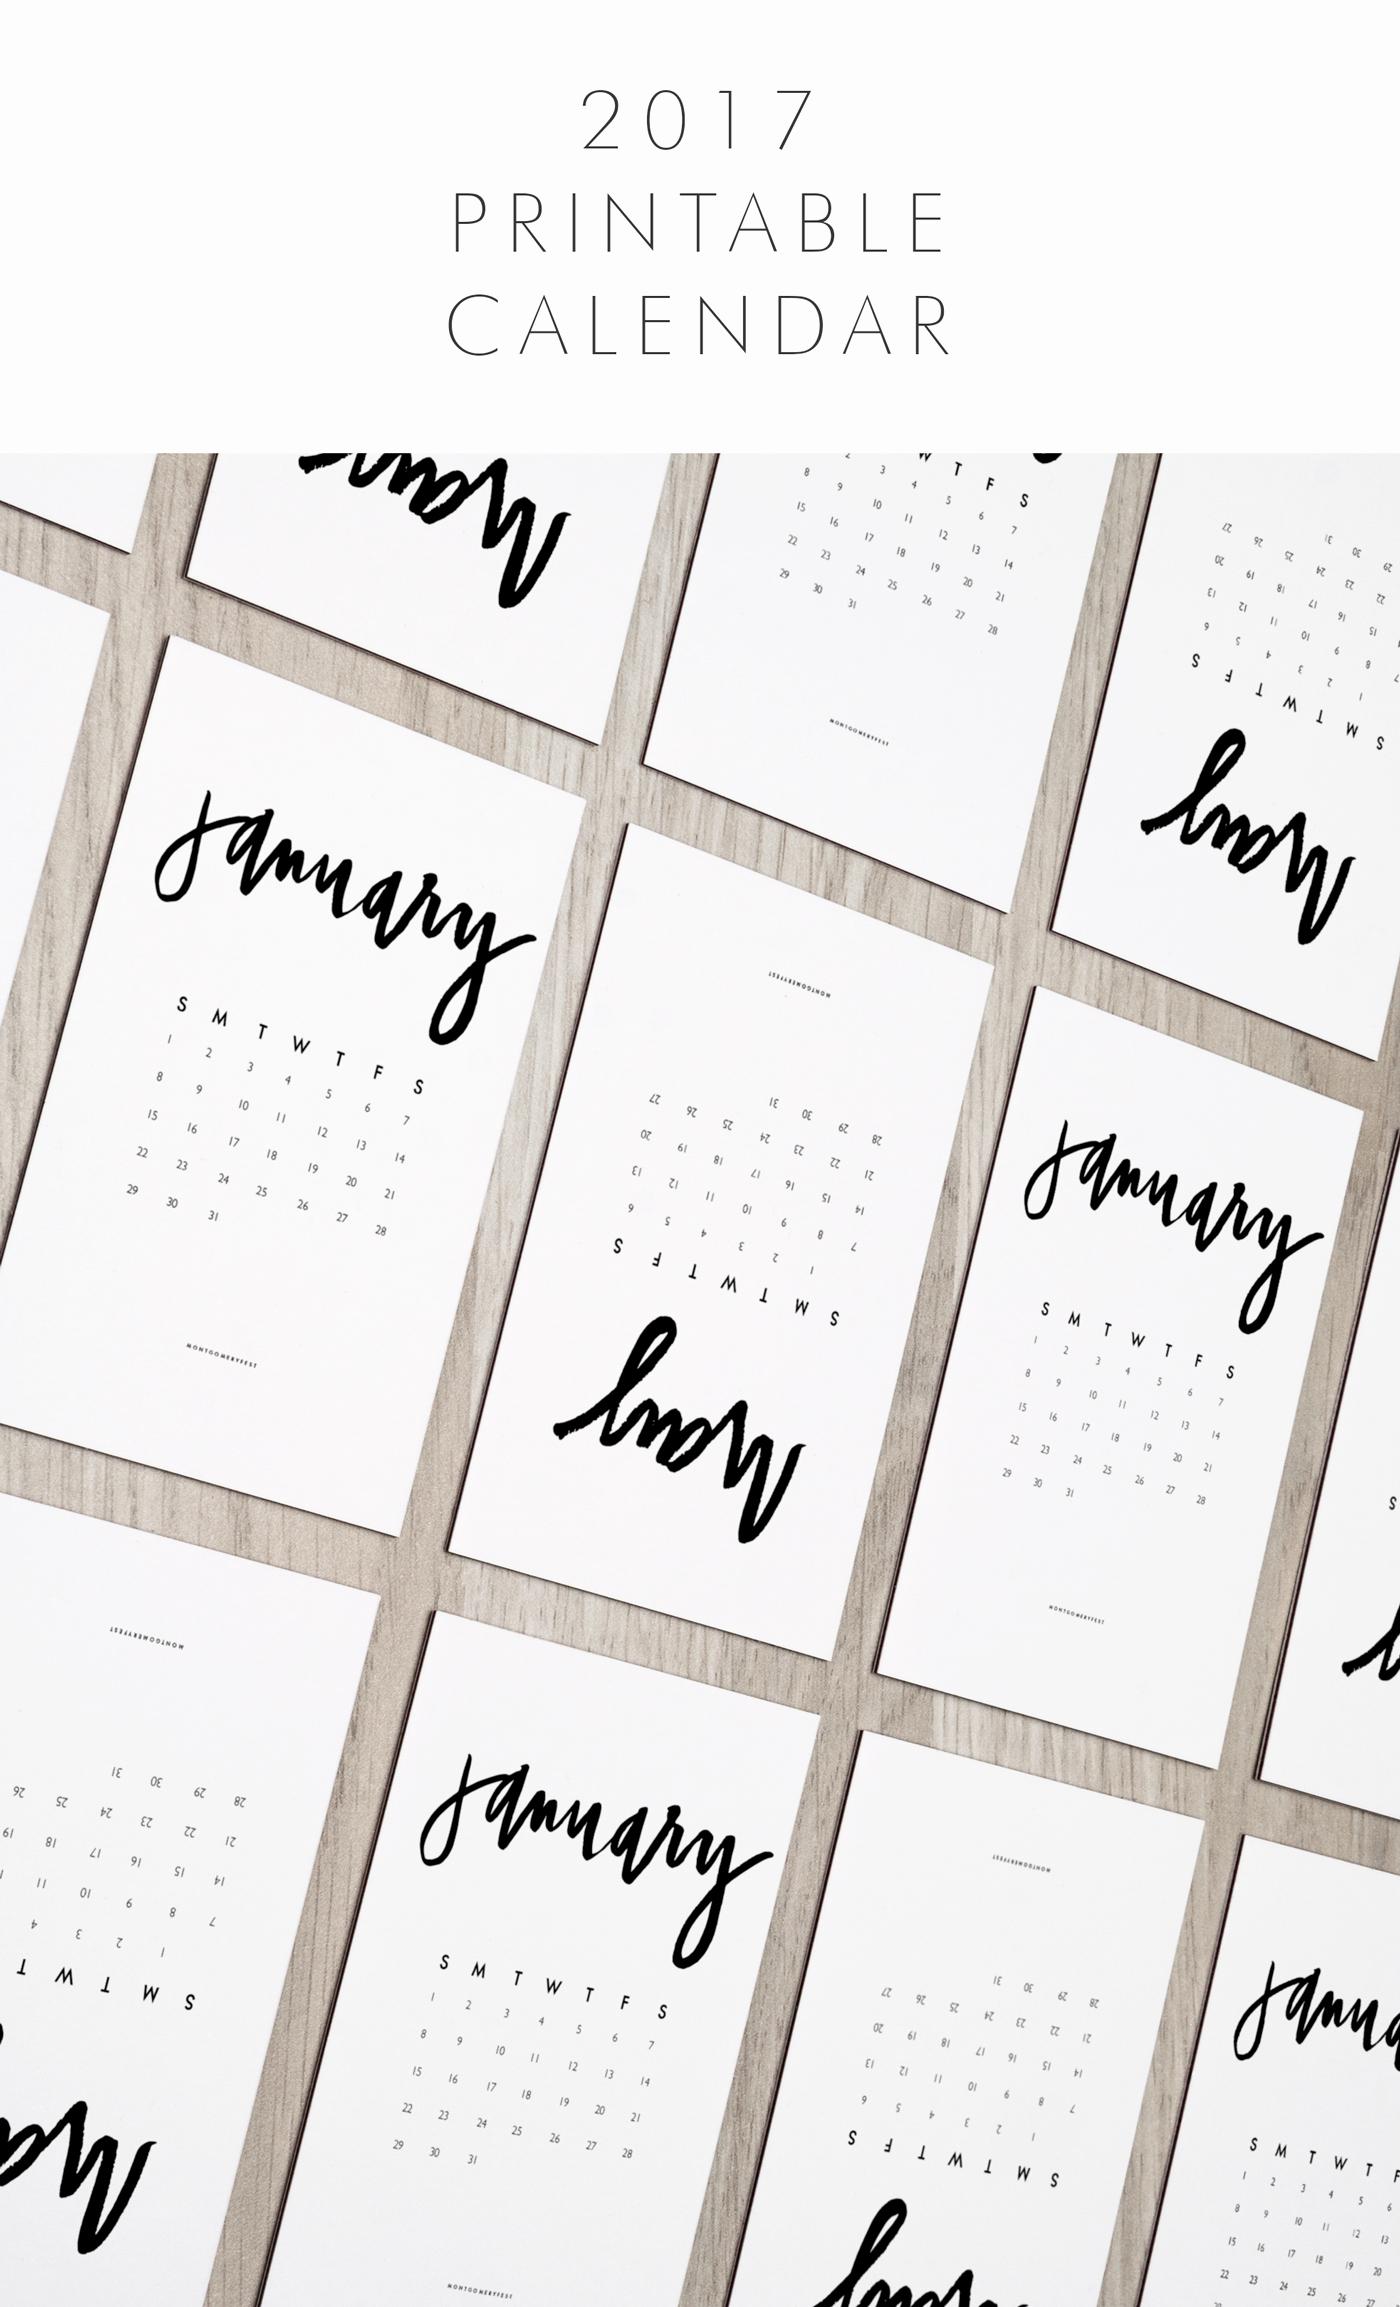 Show Me A Monthly Calendar Fresh 2017 Hand Lettered Calendar Printable Montgomeryfest